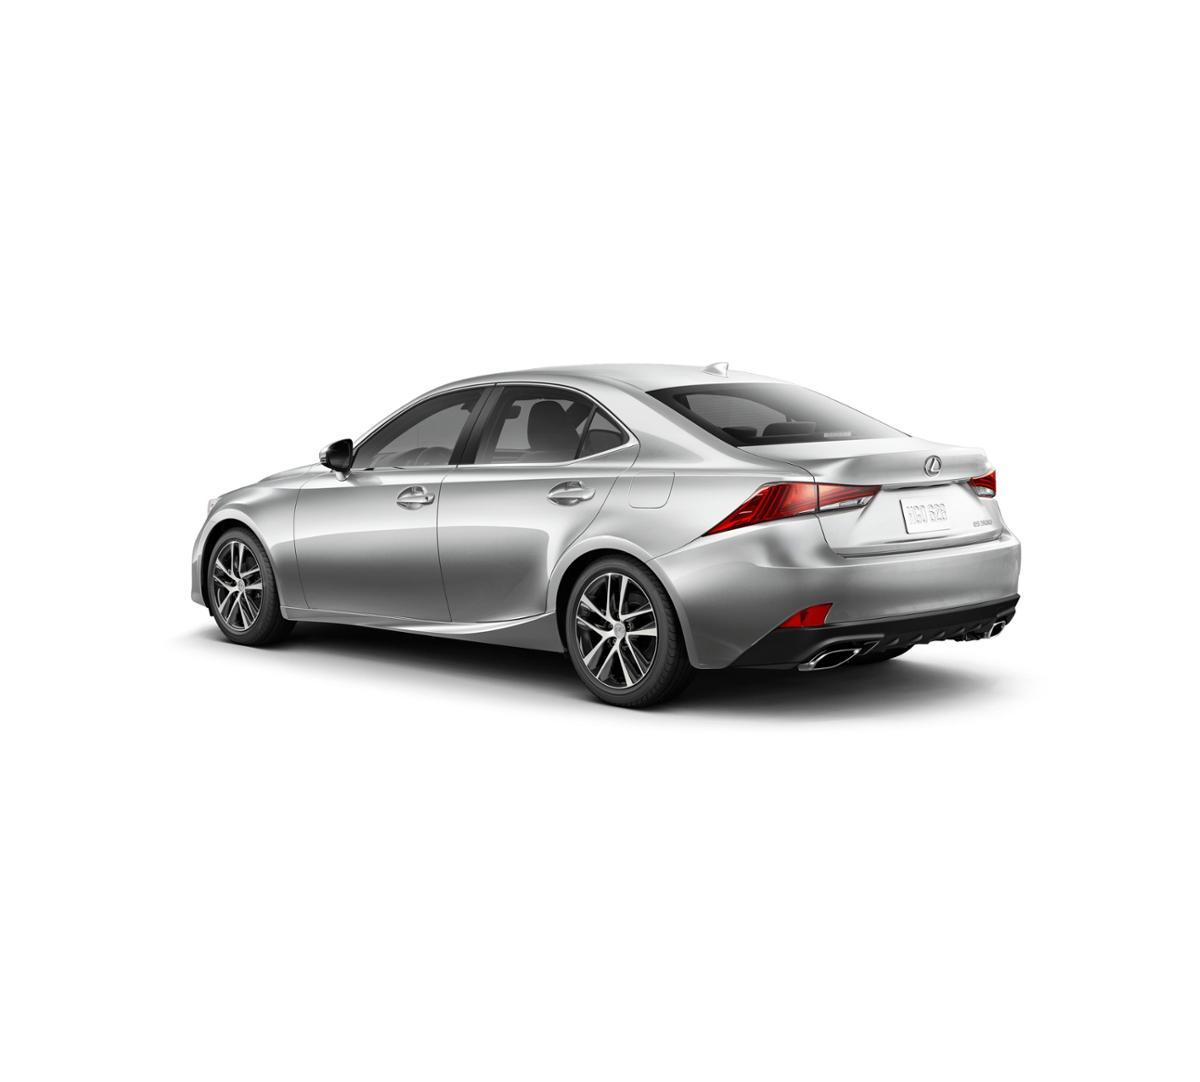 Lexus Is300 For Sale: New 2018 Lexus IS 300 (Silver Lining Metallic) For Sale In